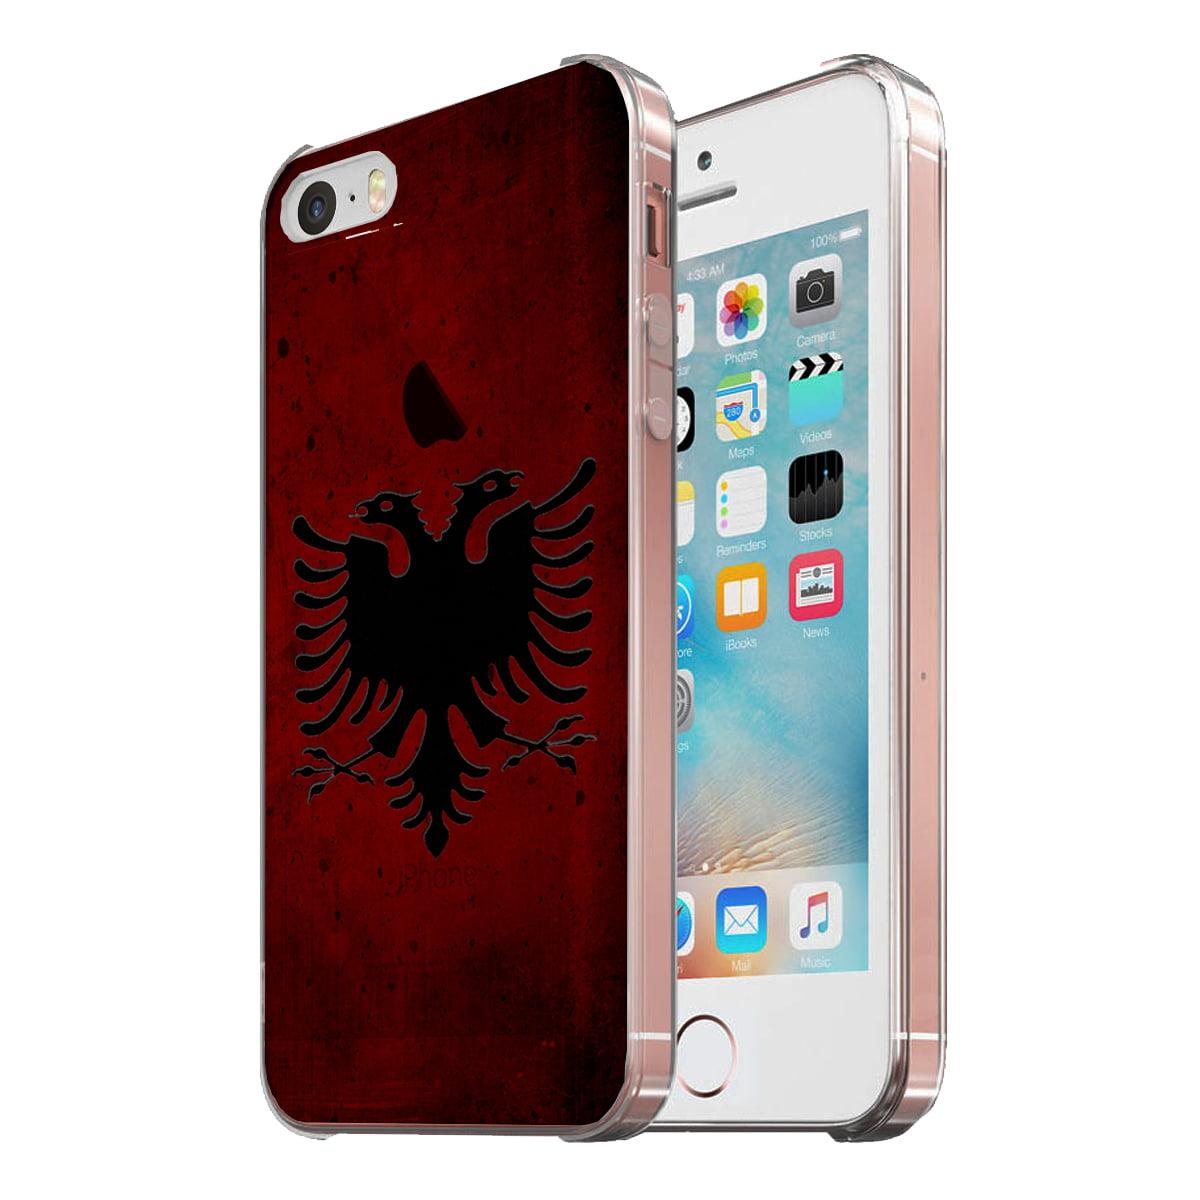 KuzmarK Clear Cover Case fits iPhone SE & iPhone 5 - Albanian Flag Modern